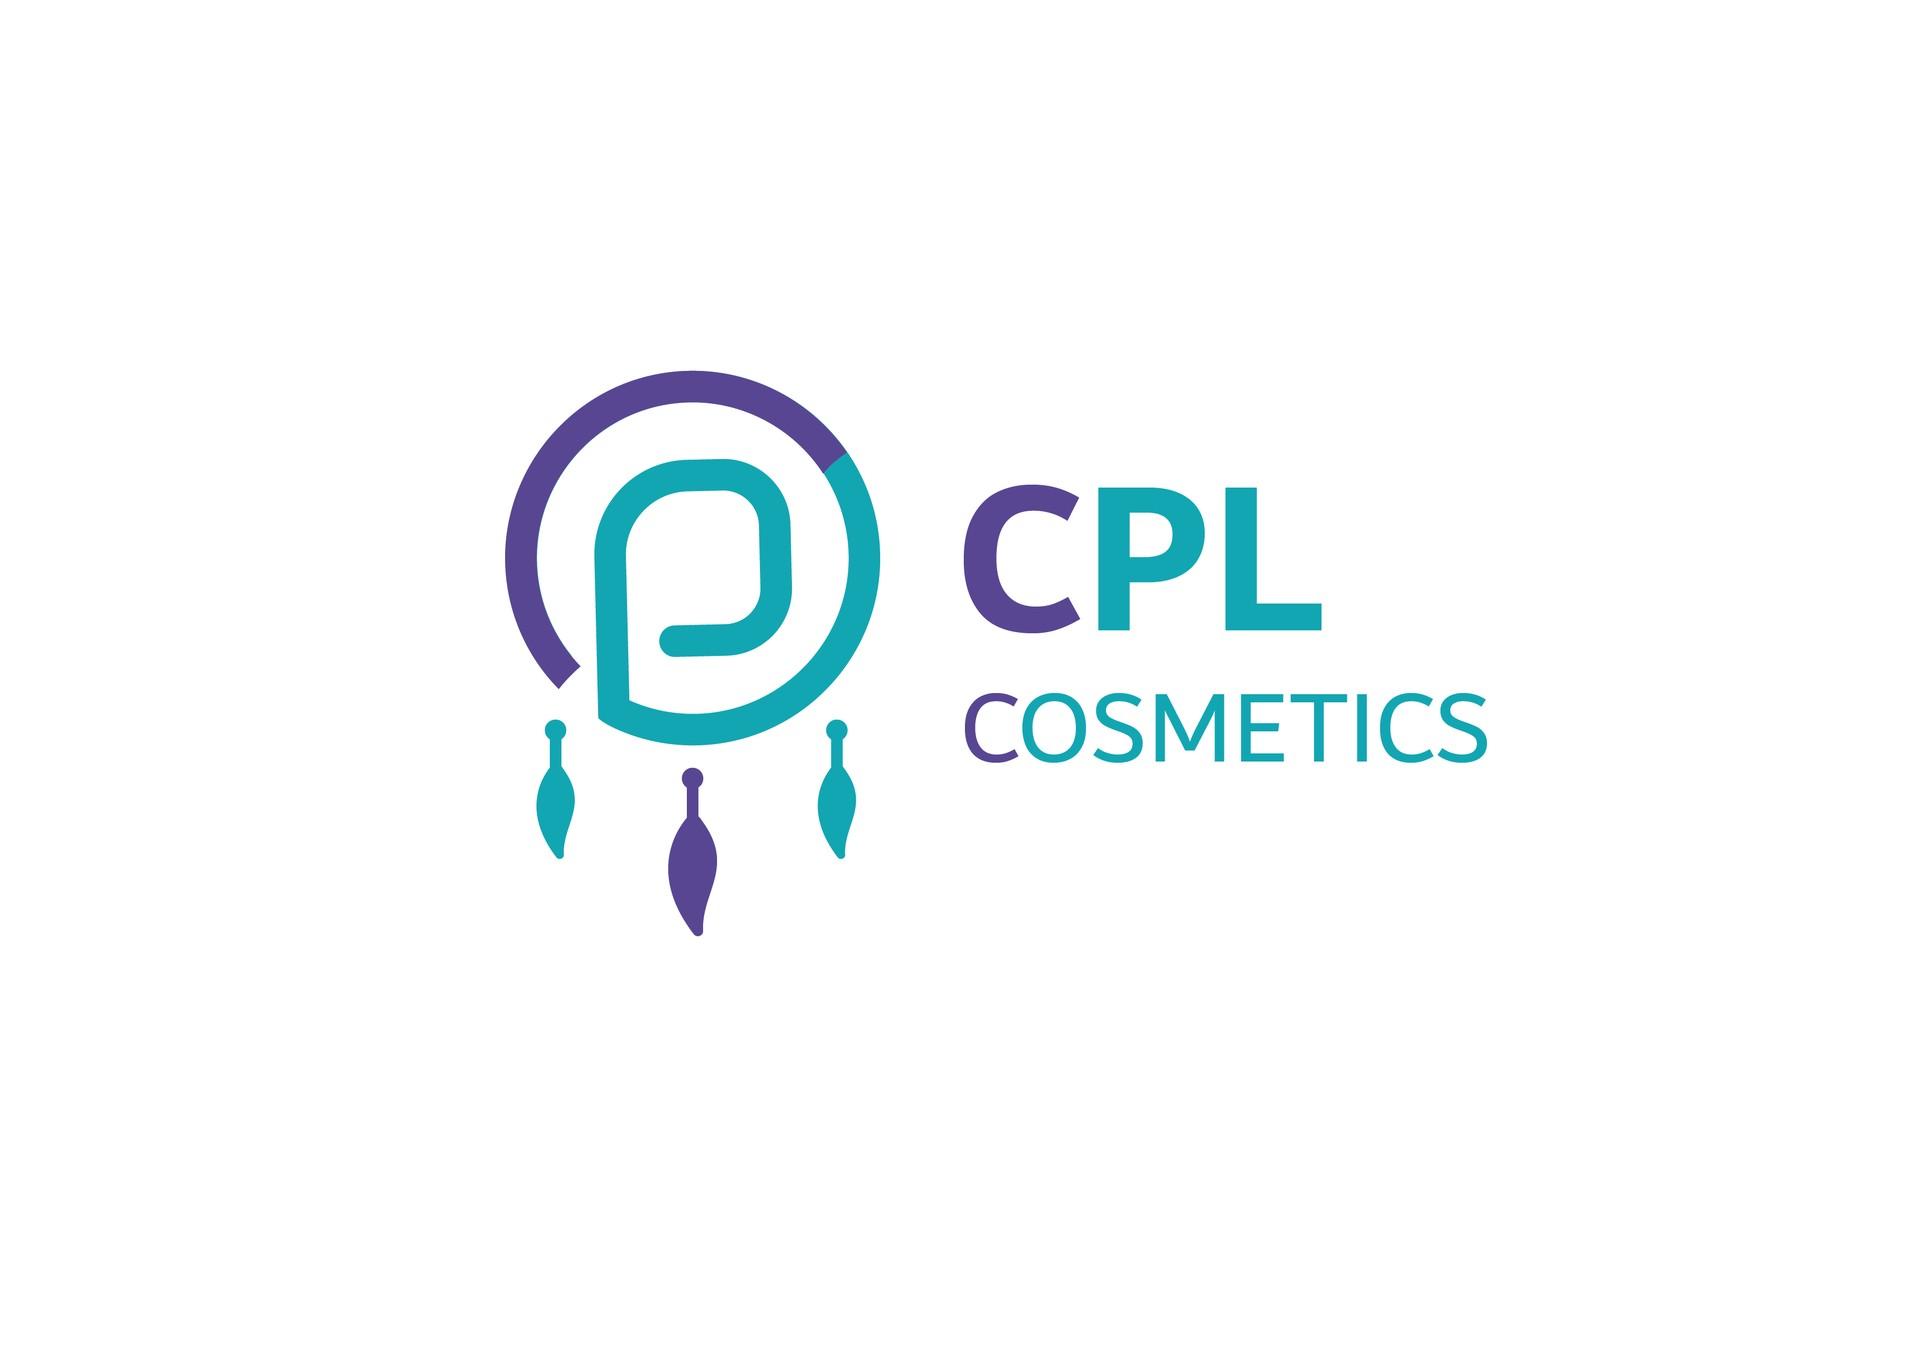 CPL Cosmetics